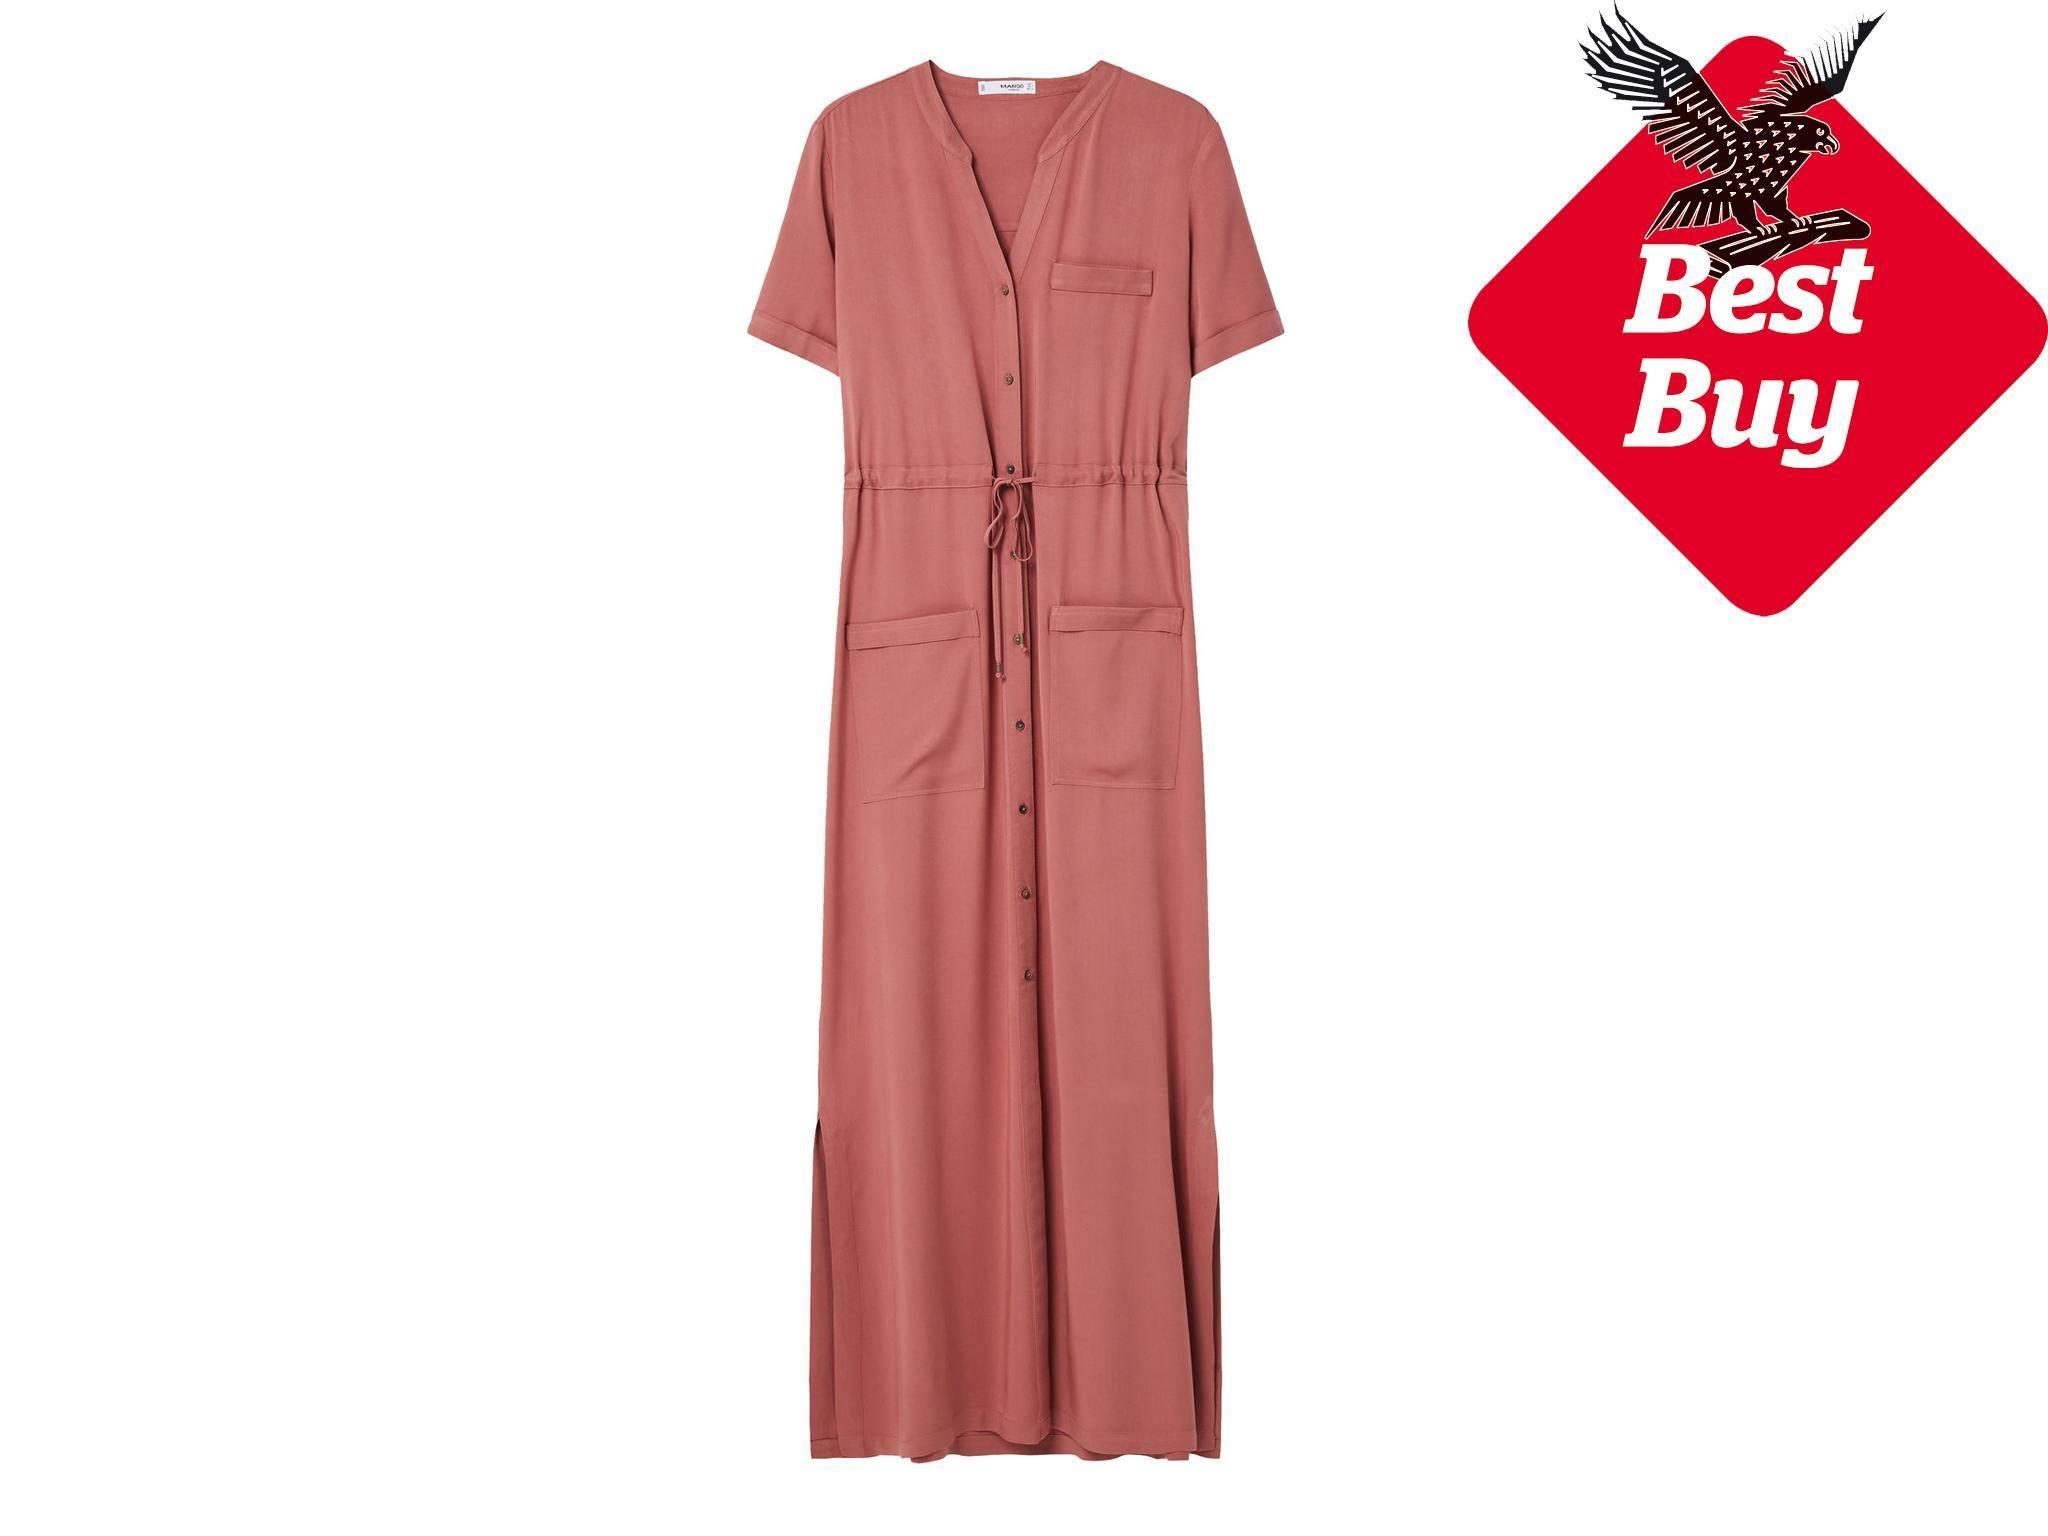 8e573a915b Read more. 9 best wedding guest dresses